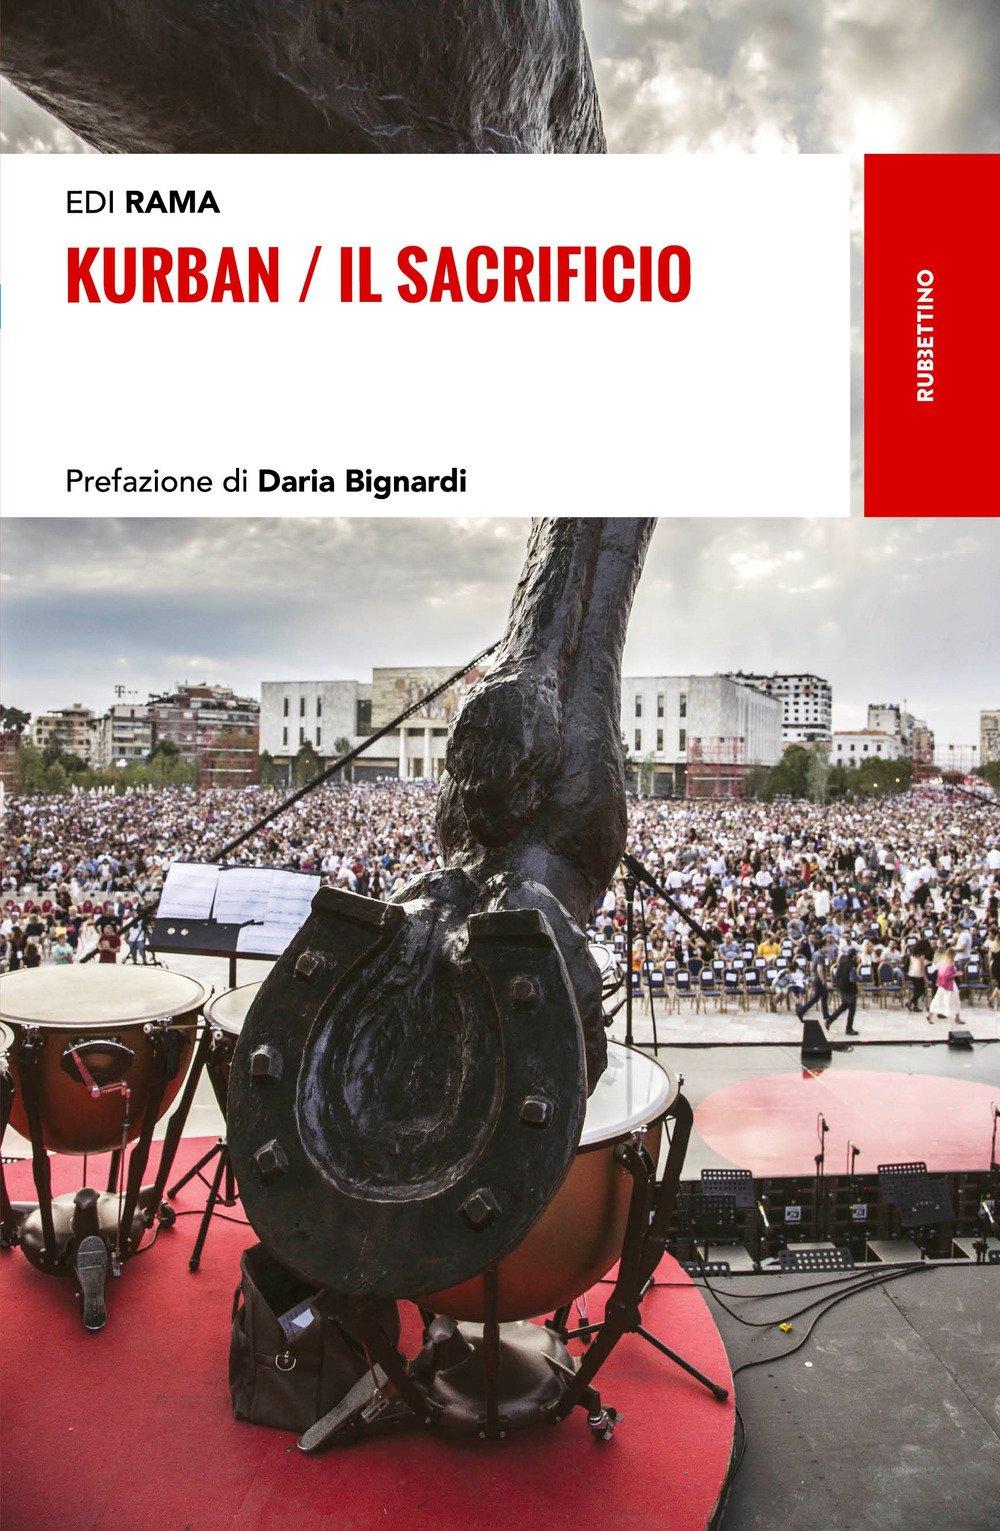 Kurban. Il sacrificio Copertina flessibile – 3 mag 2018 Edi Rama Rubbettino 8849850425 Albania